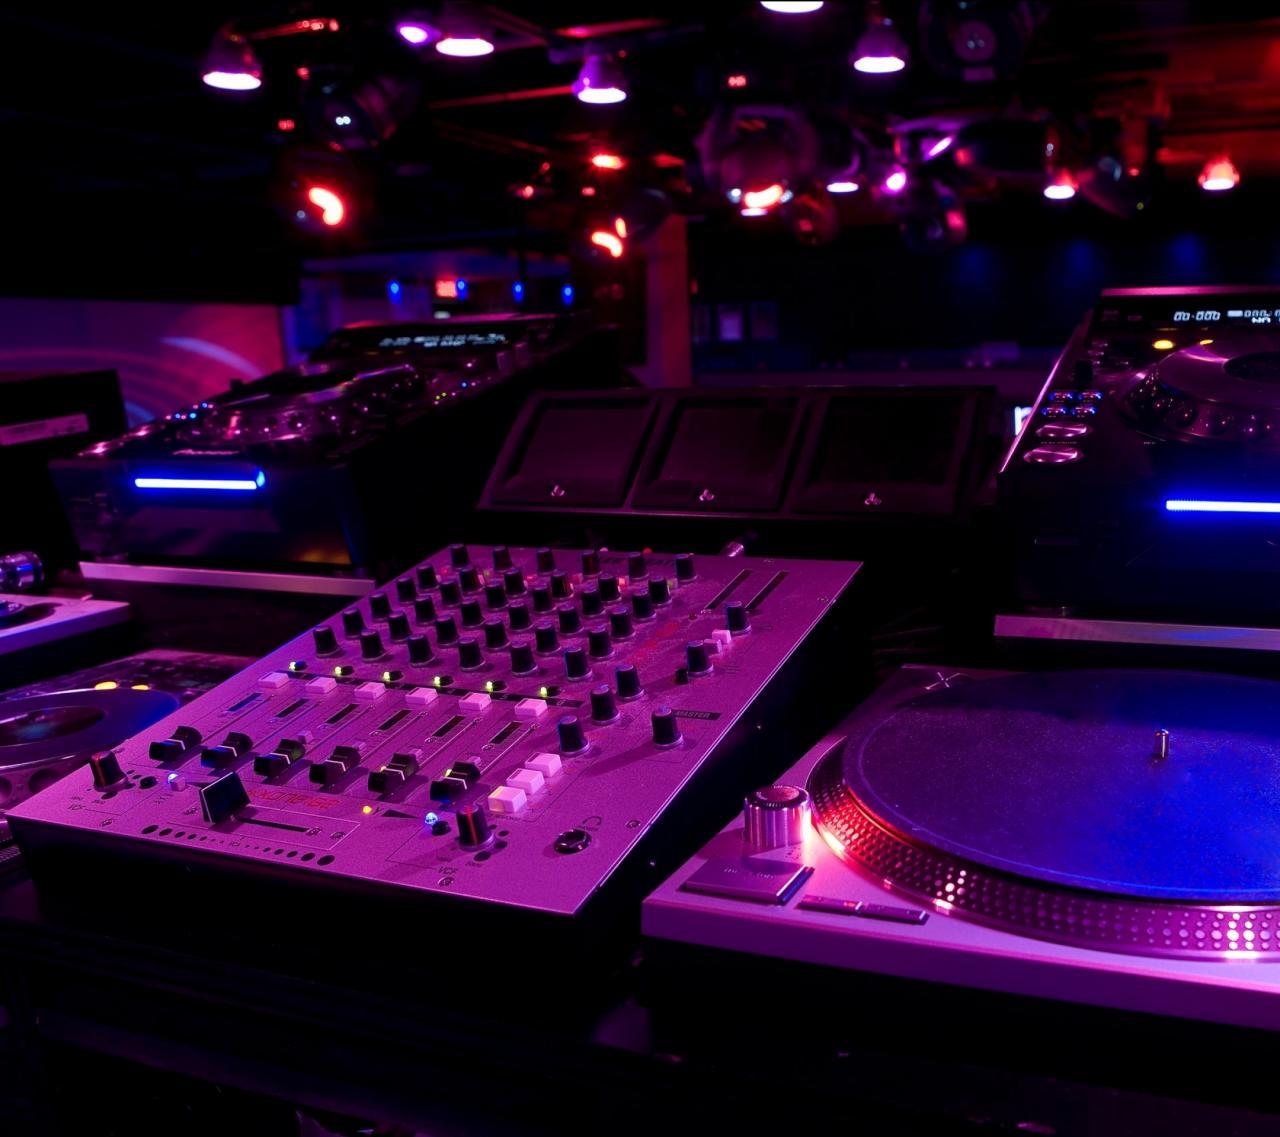 2160x1920 Music DJ Colorful. Wallpaper 384396